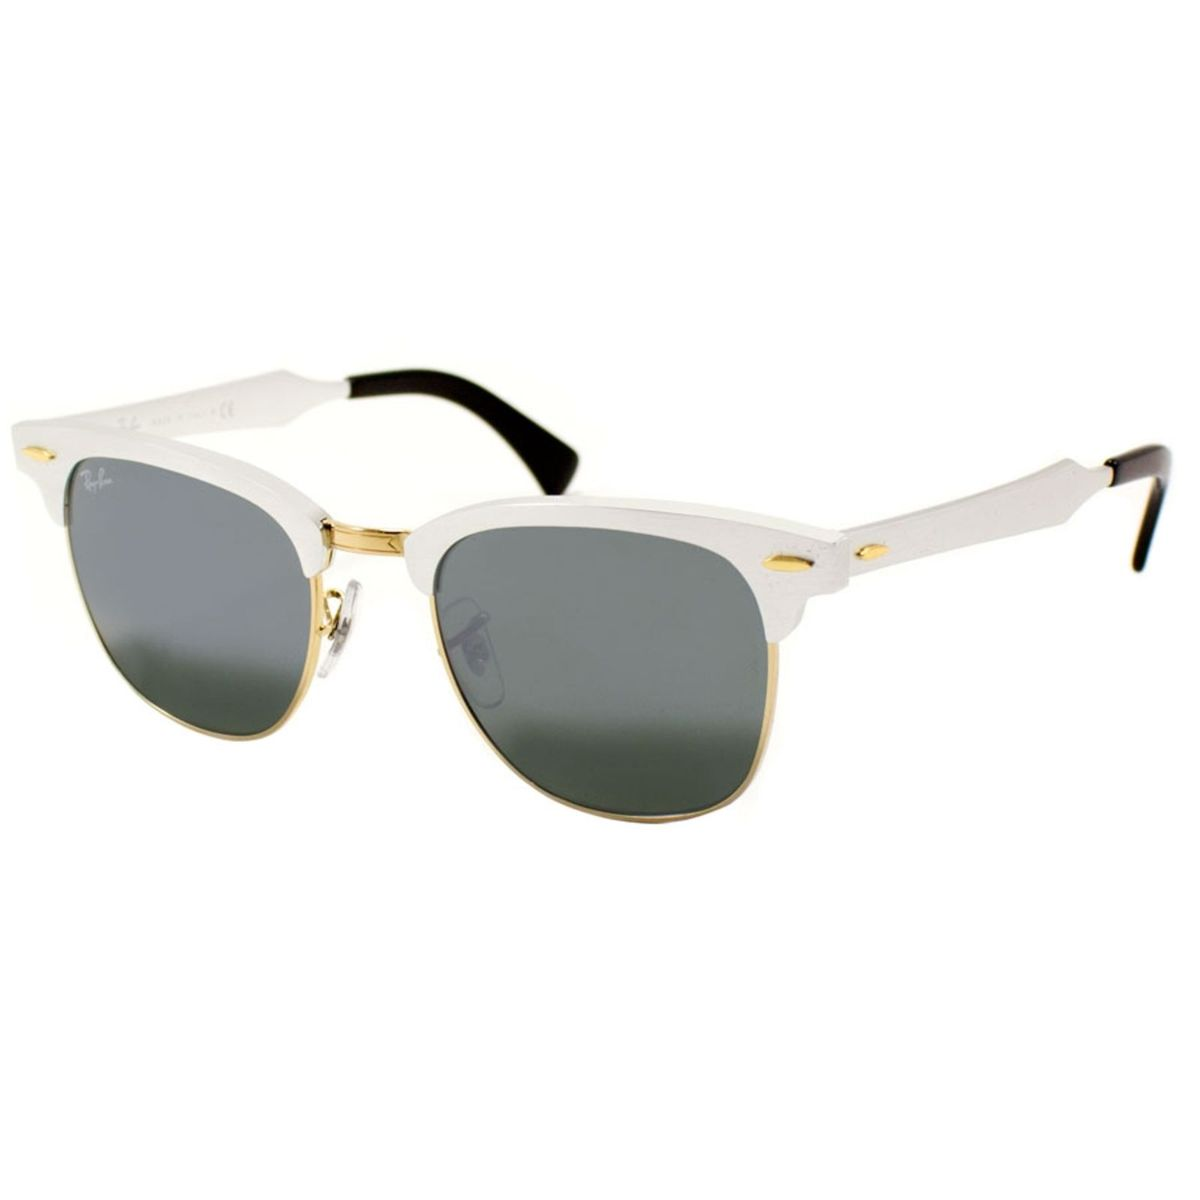 Óculos Ray-ban Clubmaster Aluminium   Óculos Feminino Ray Ban Nunca ... 307fe033ad